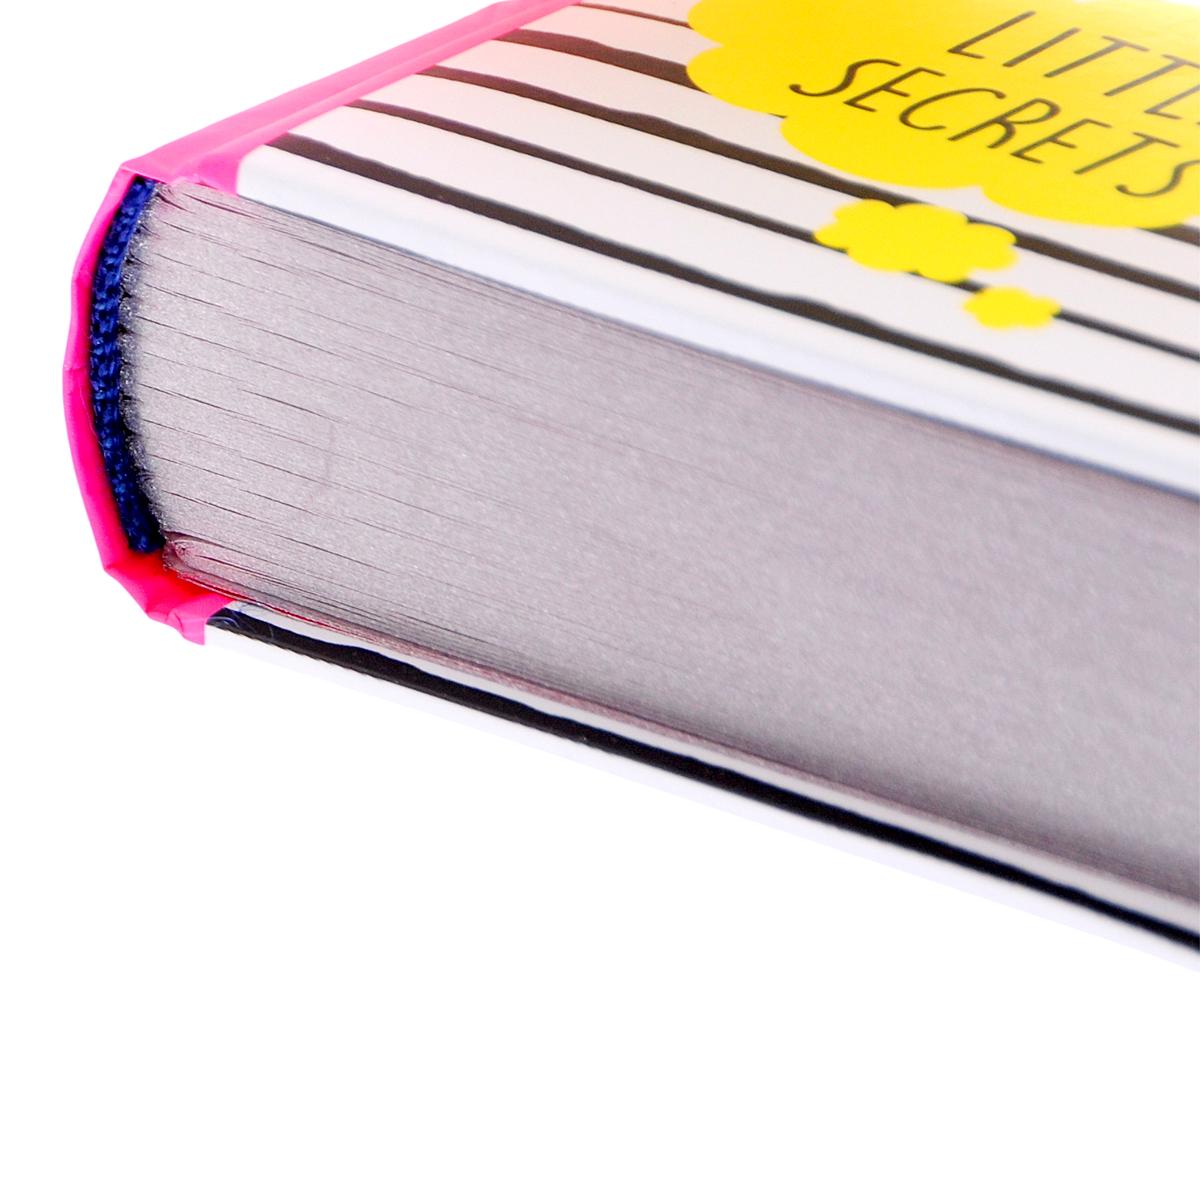 My №1 Diary: Big Plans: Little Secrets